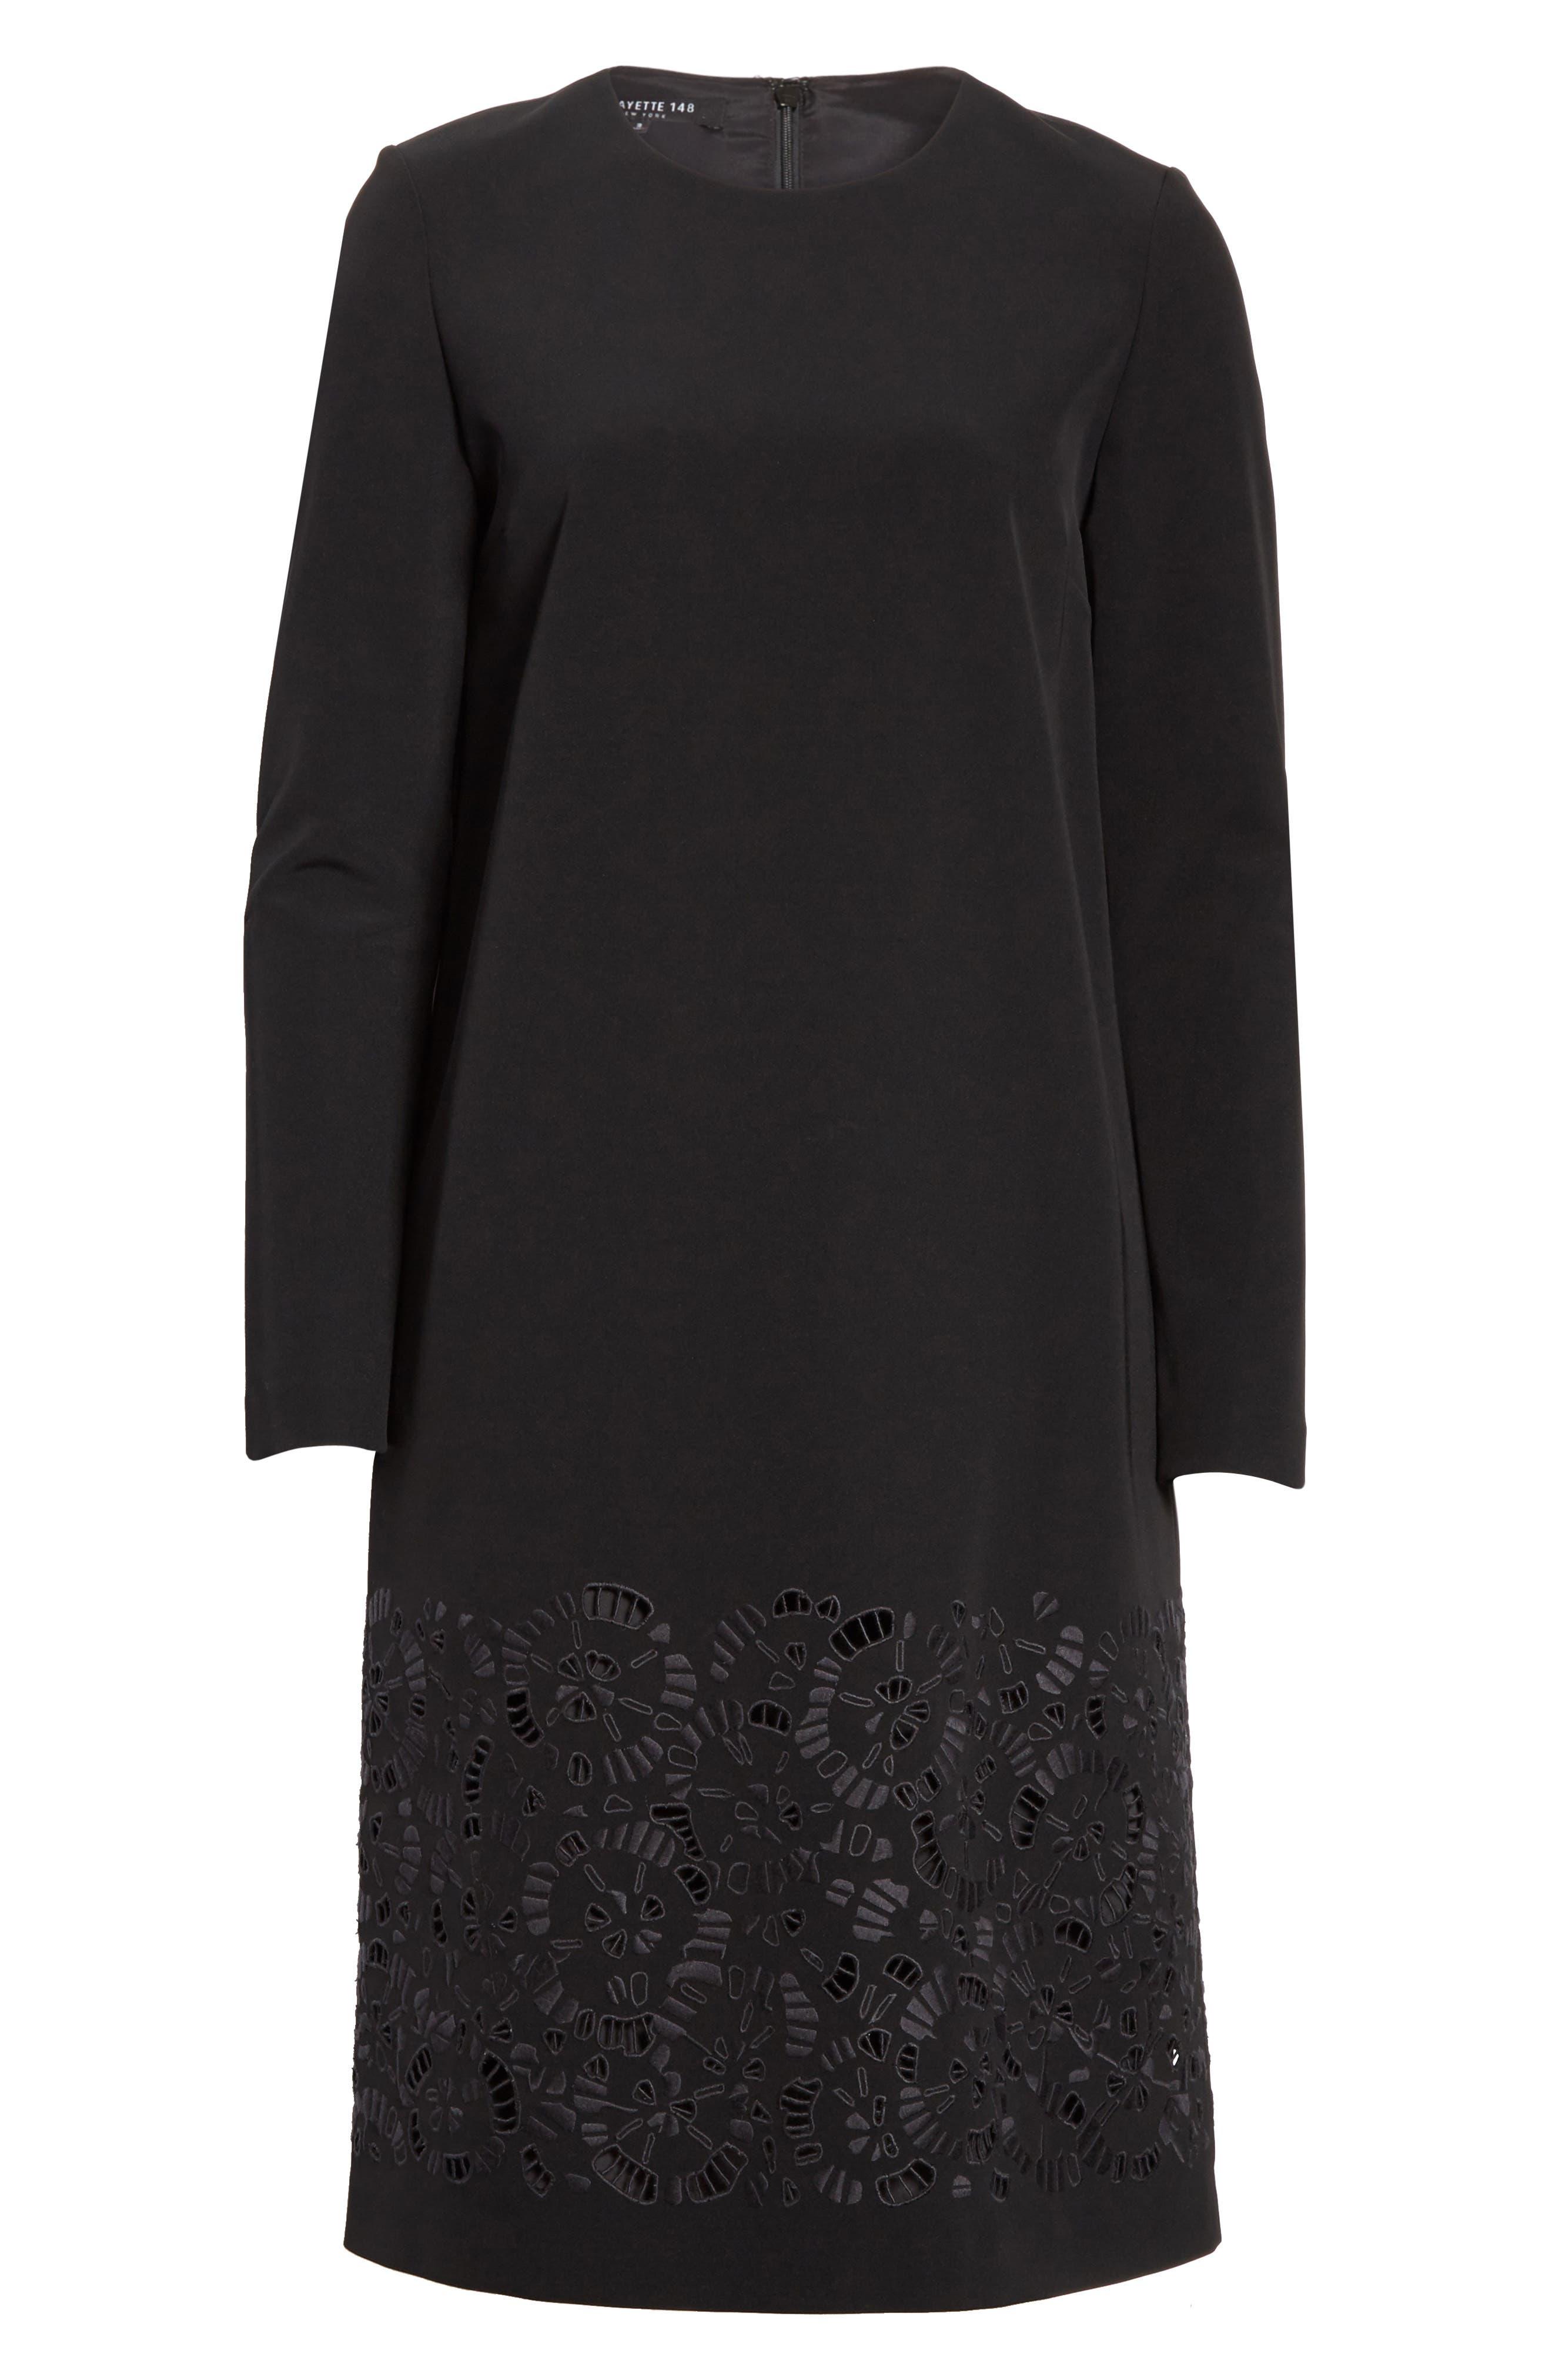 Corbin Embroidered Laser Cut Dress,                             Alternate thumbnail 7, color,                             Black